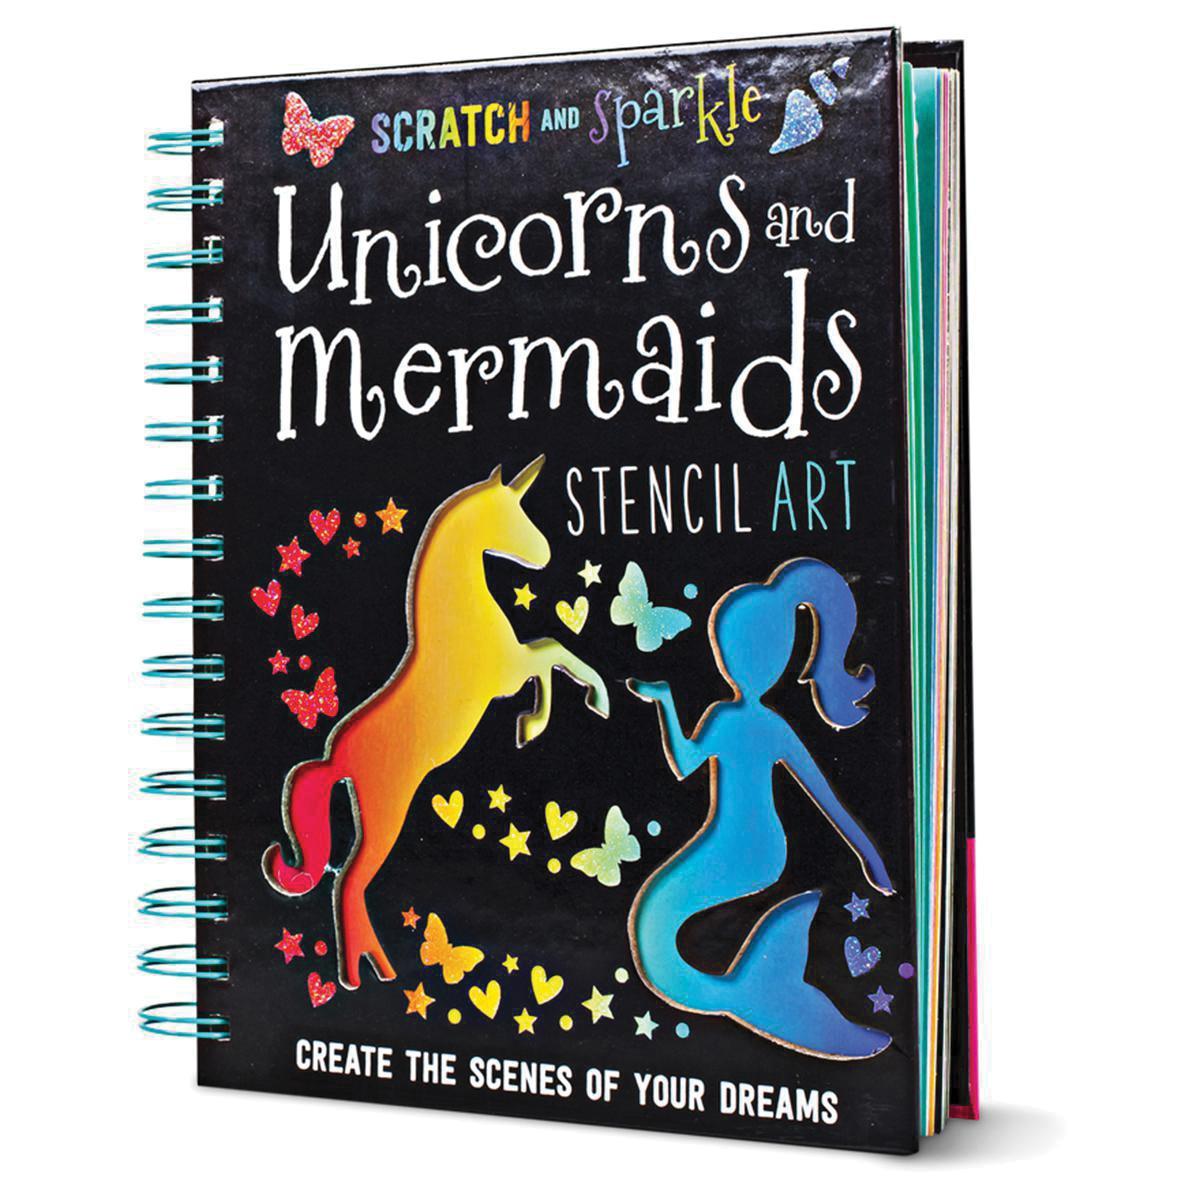 Scratch and Sparkle: Unicorns and Mermaids Stencil Art